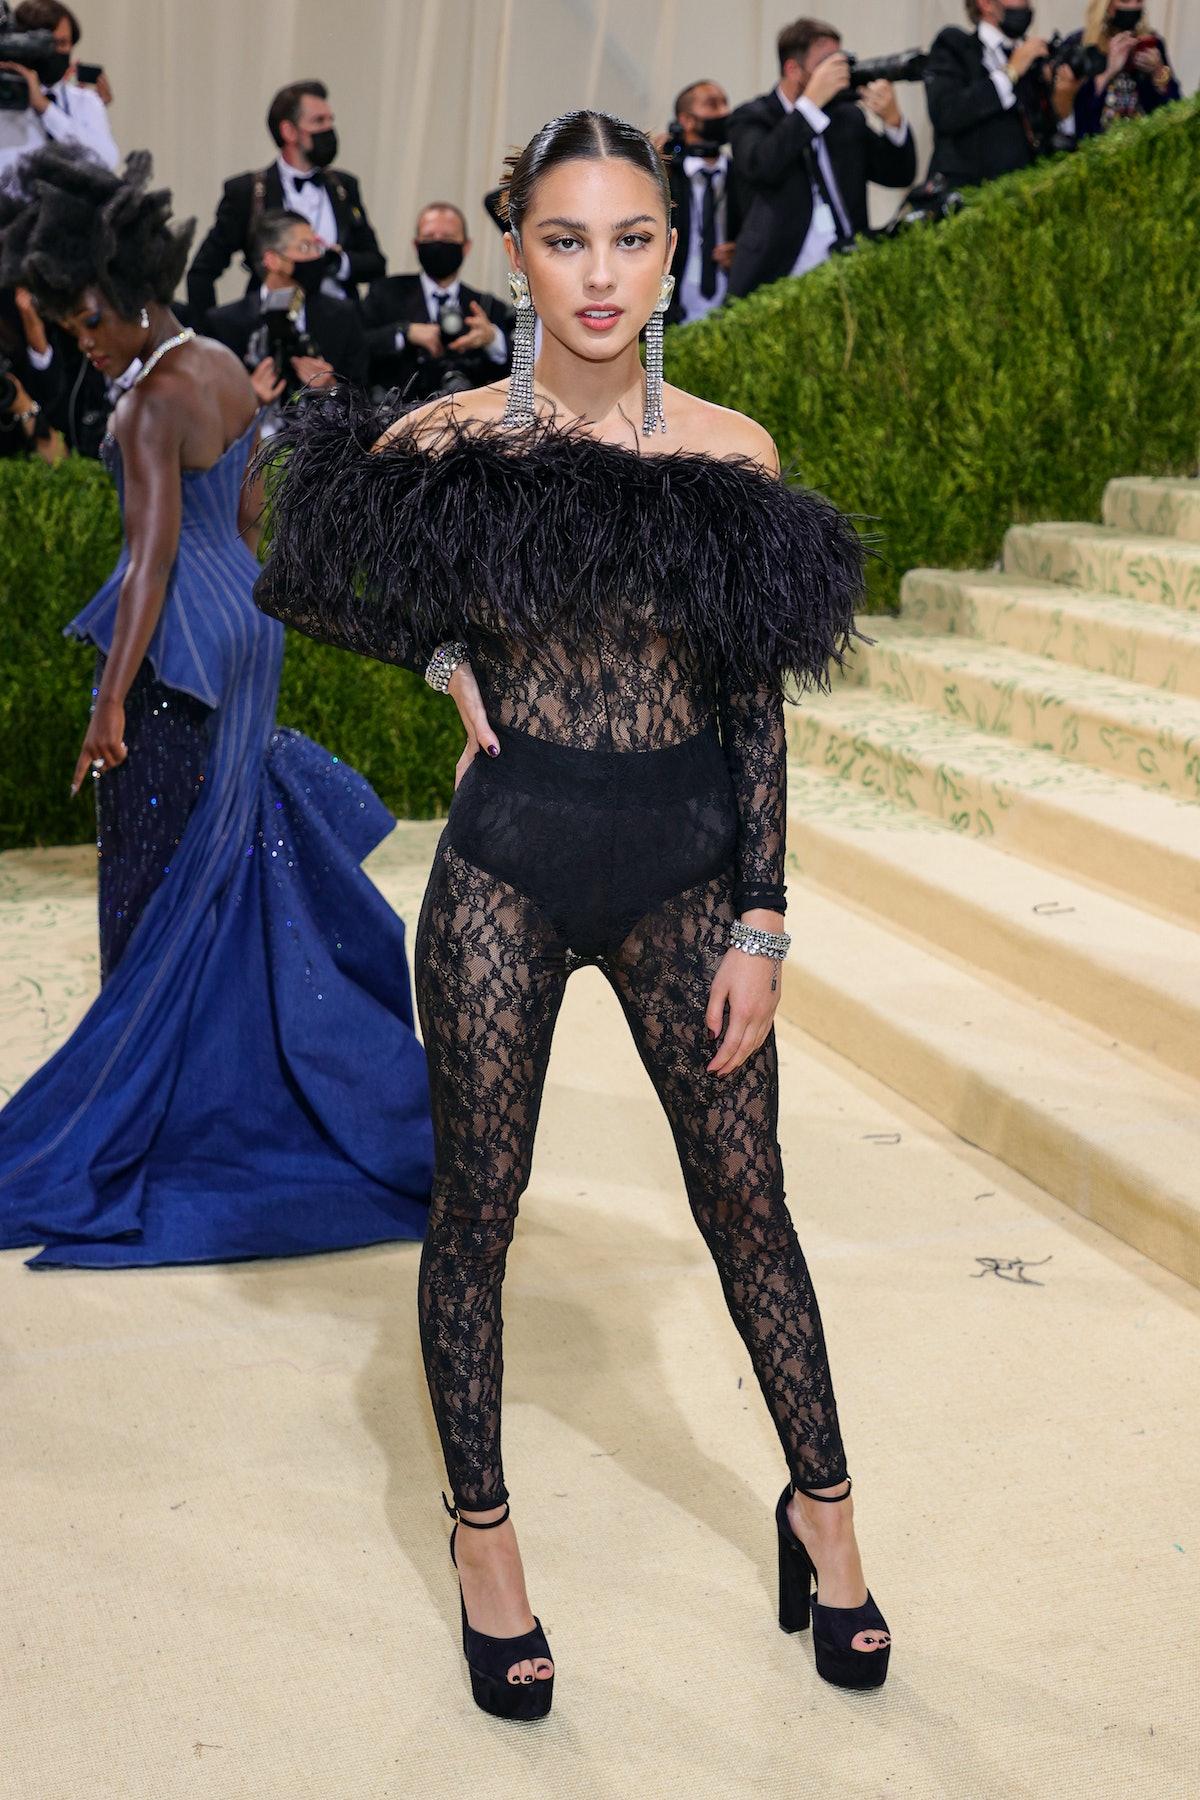 Olivia Rodrigo attends The 2021 Met Gala Celebrating In America: A Lexicon Of Fashion at Metropolita...